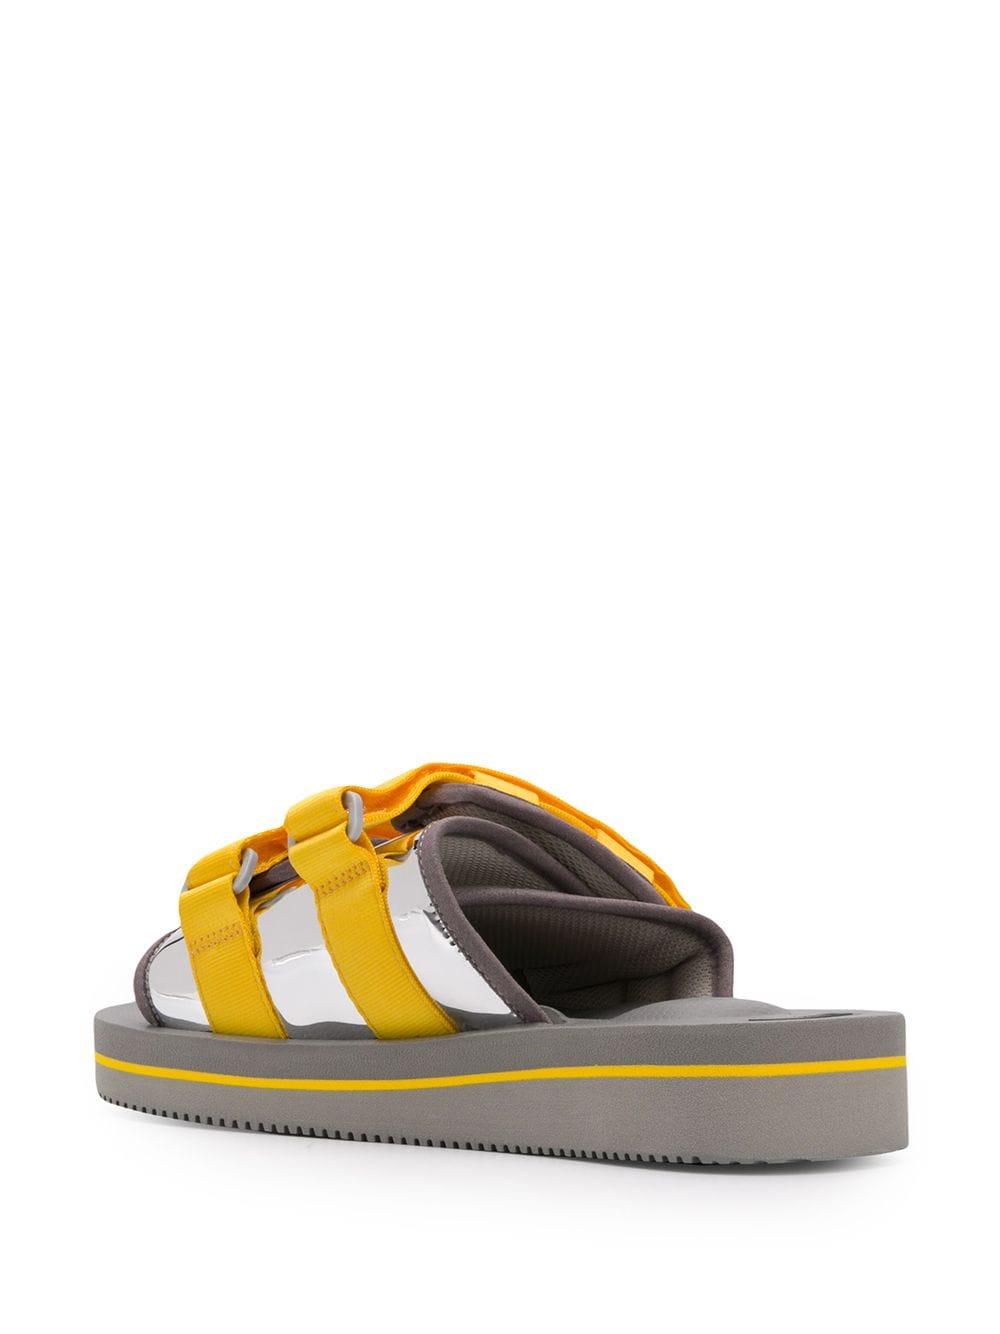 Picture of Suicoke | Sandals